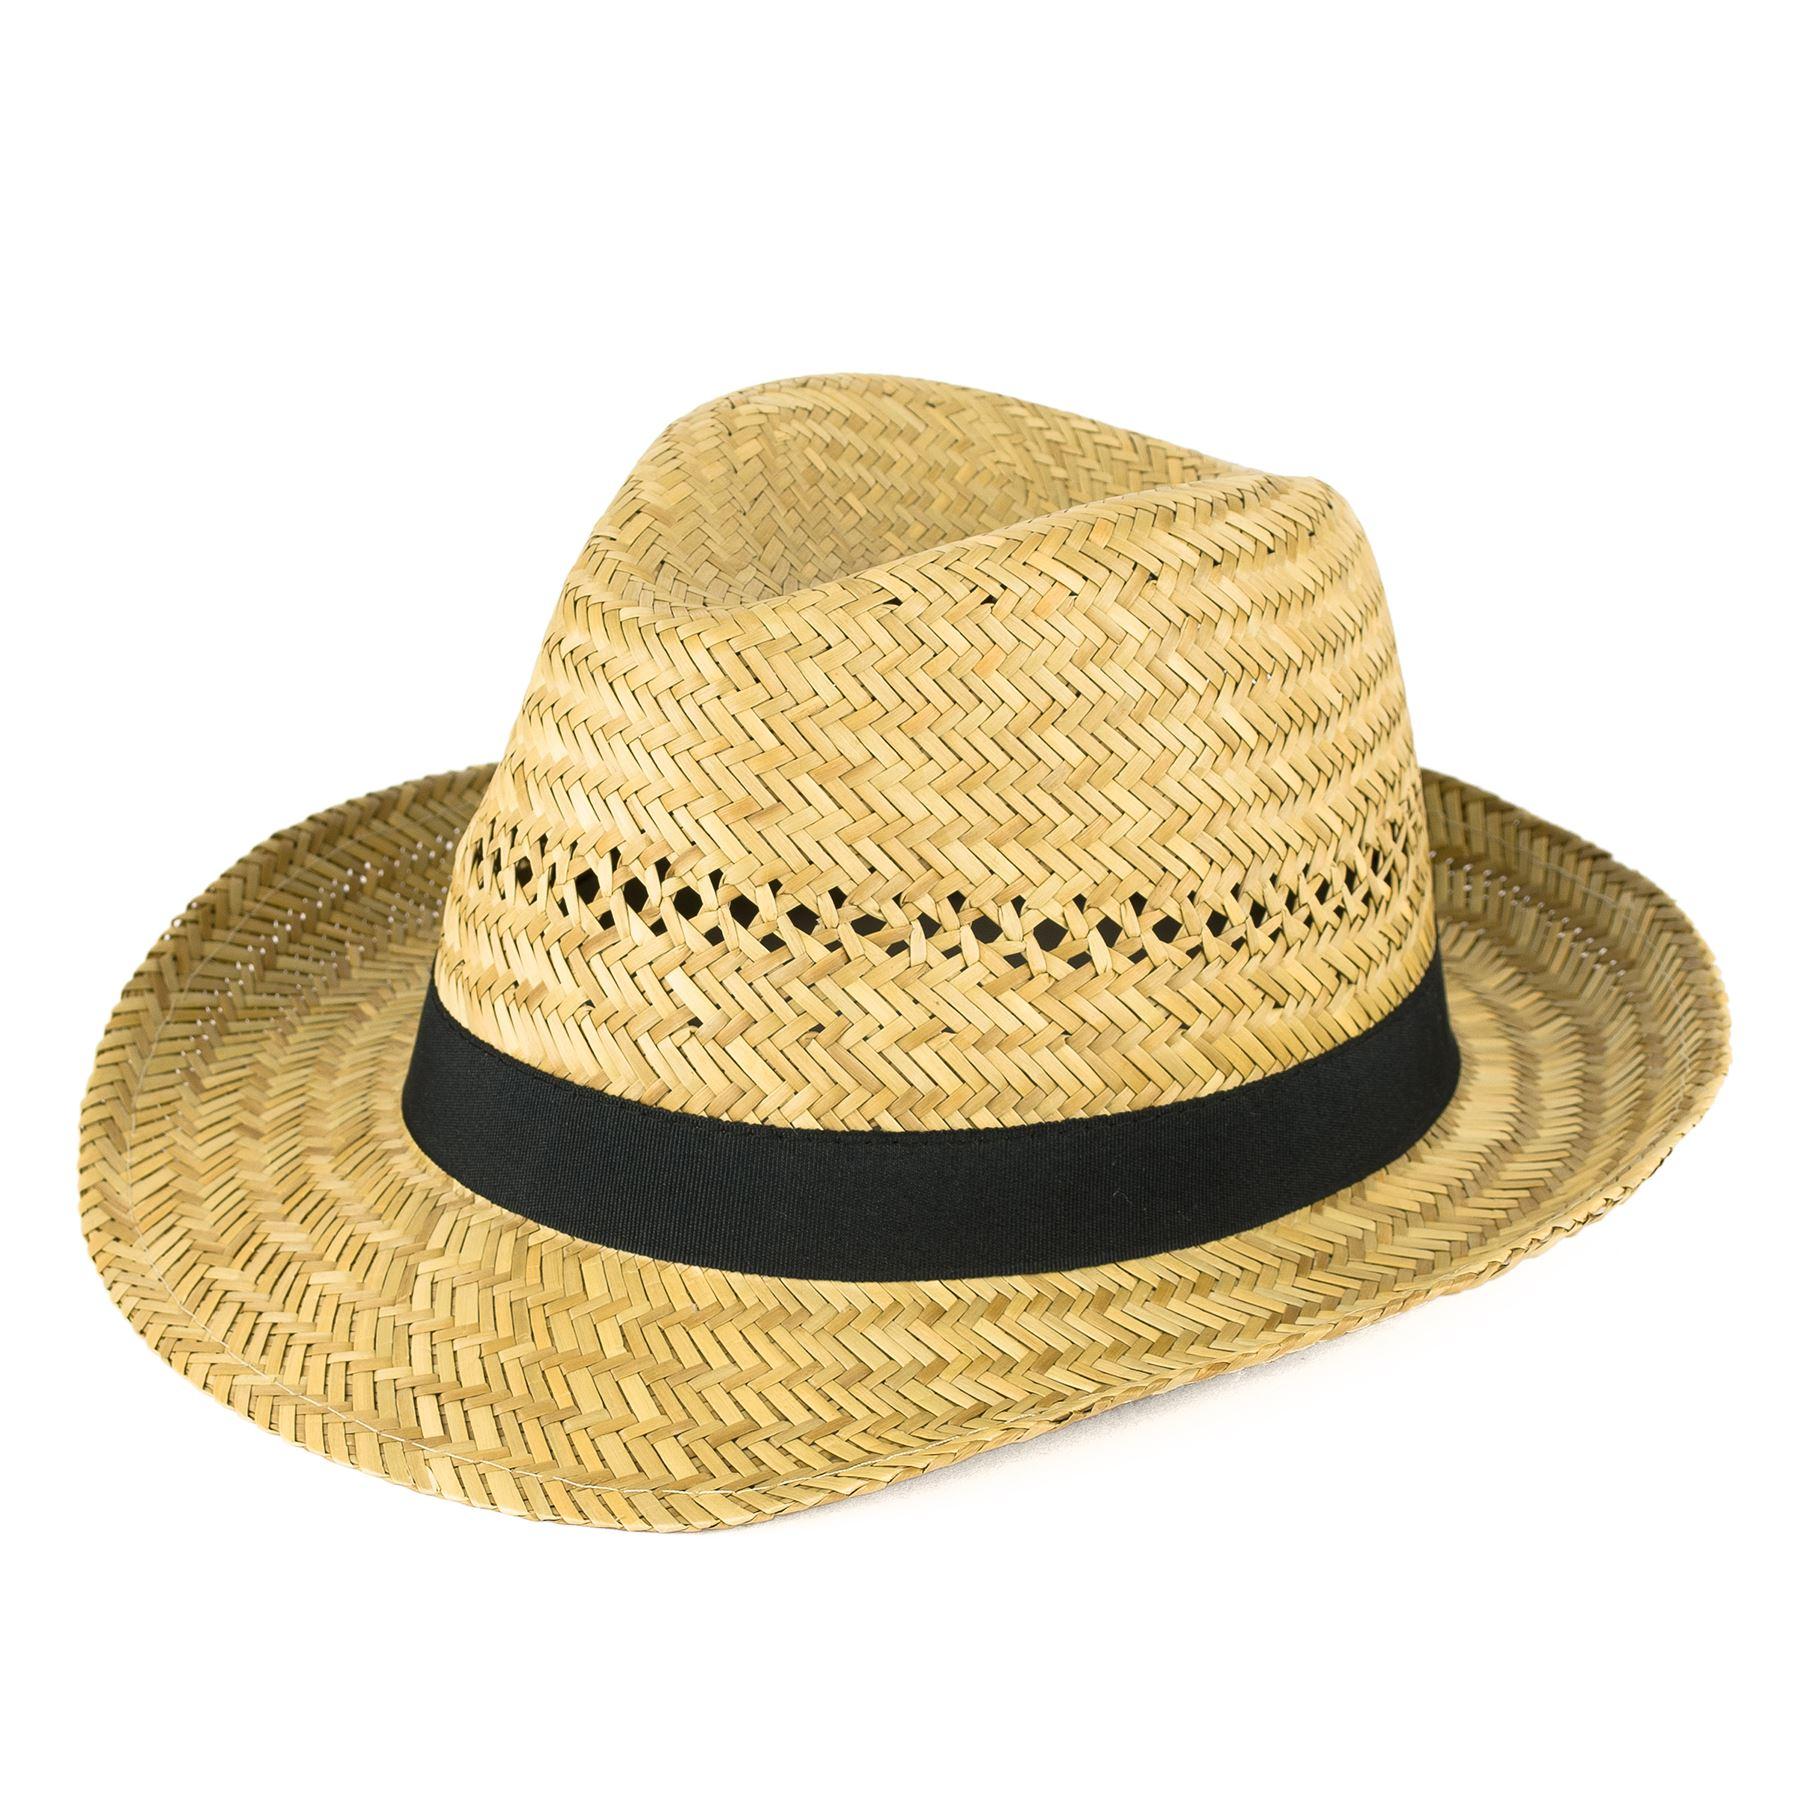 Straw Fedora Hat with Black Grosgrain Band  ce0ef7e2fbaa